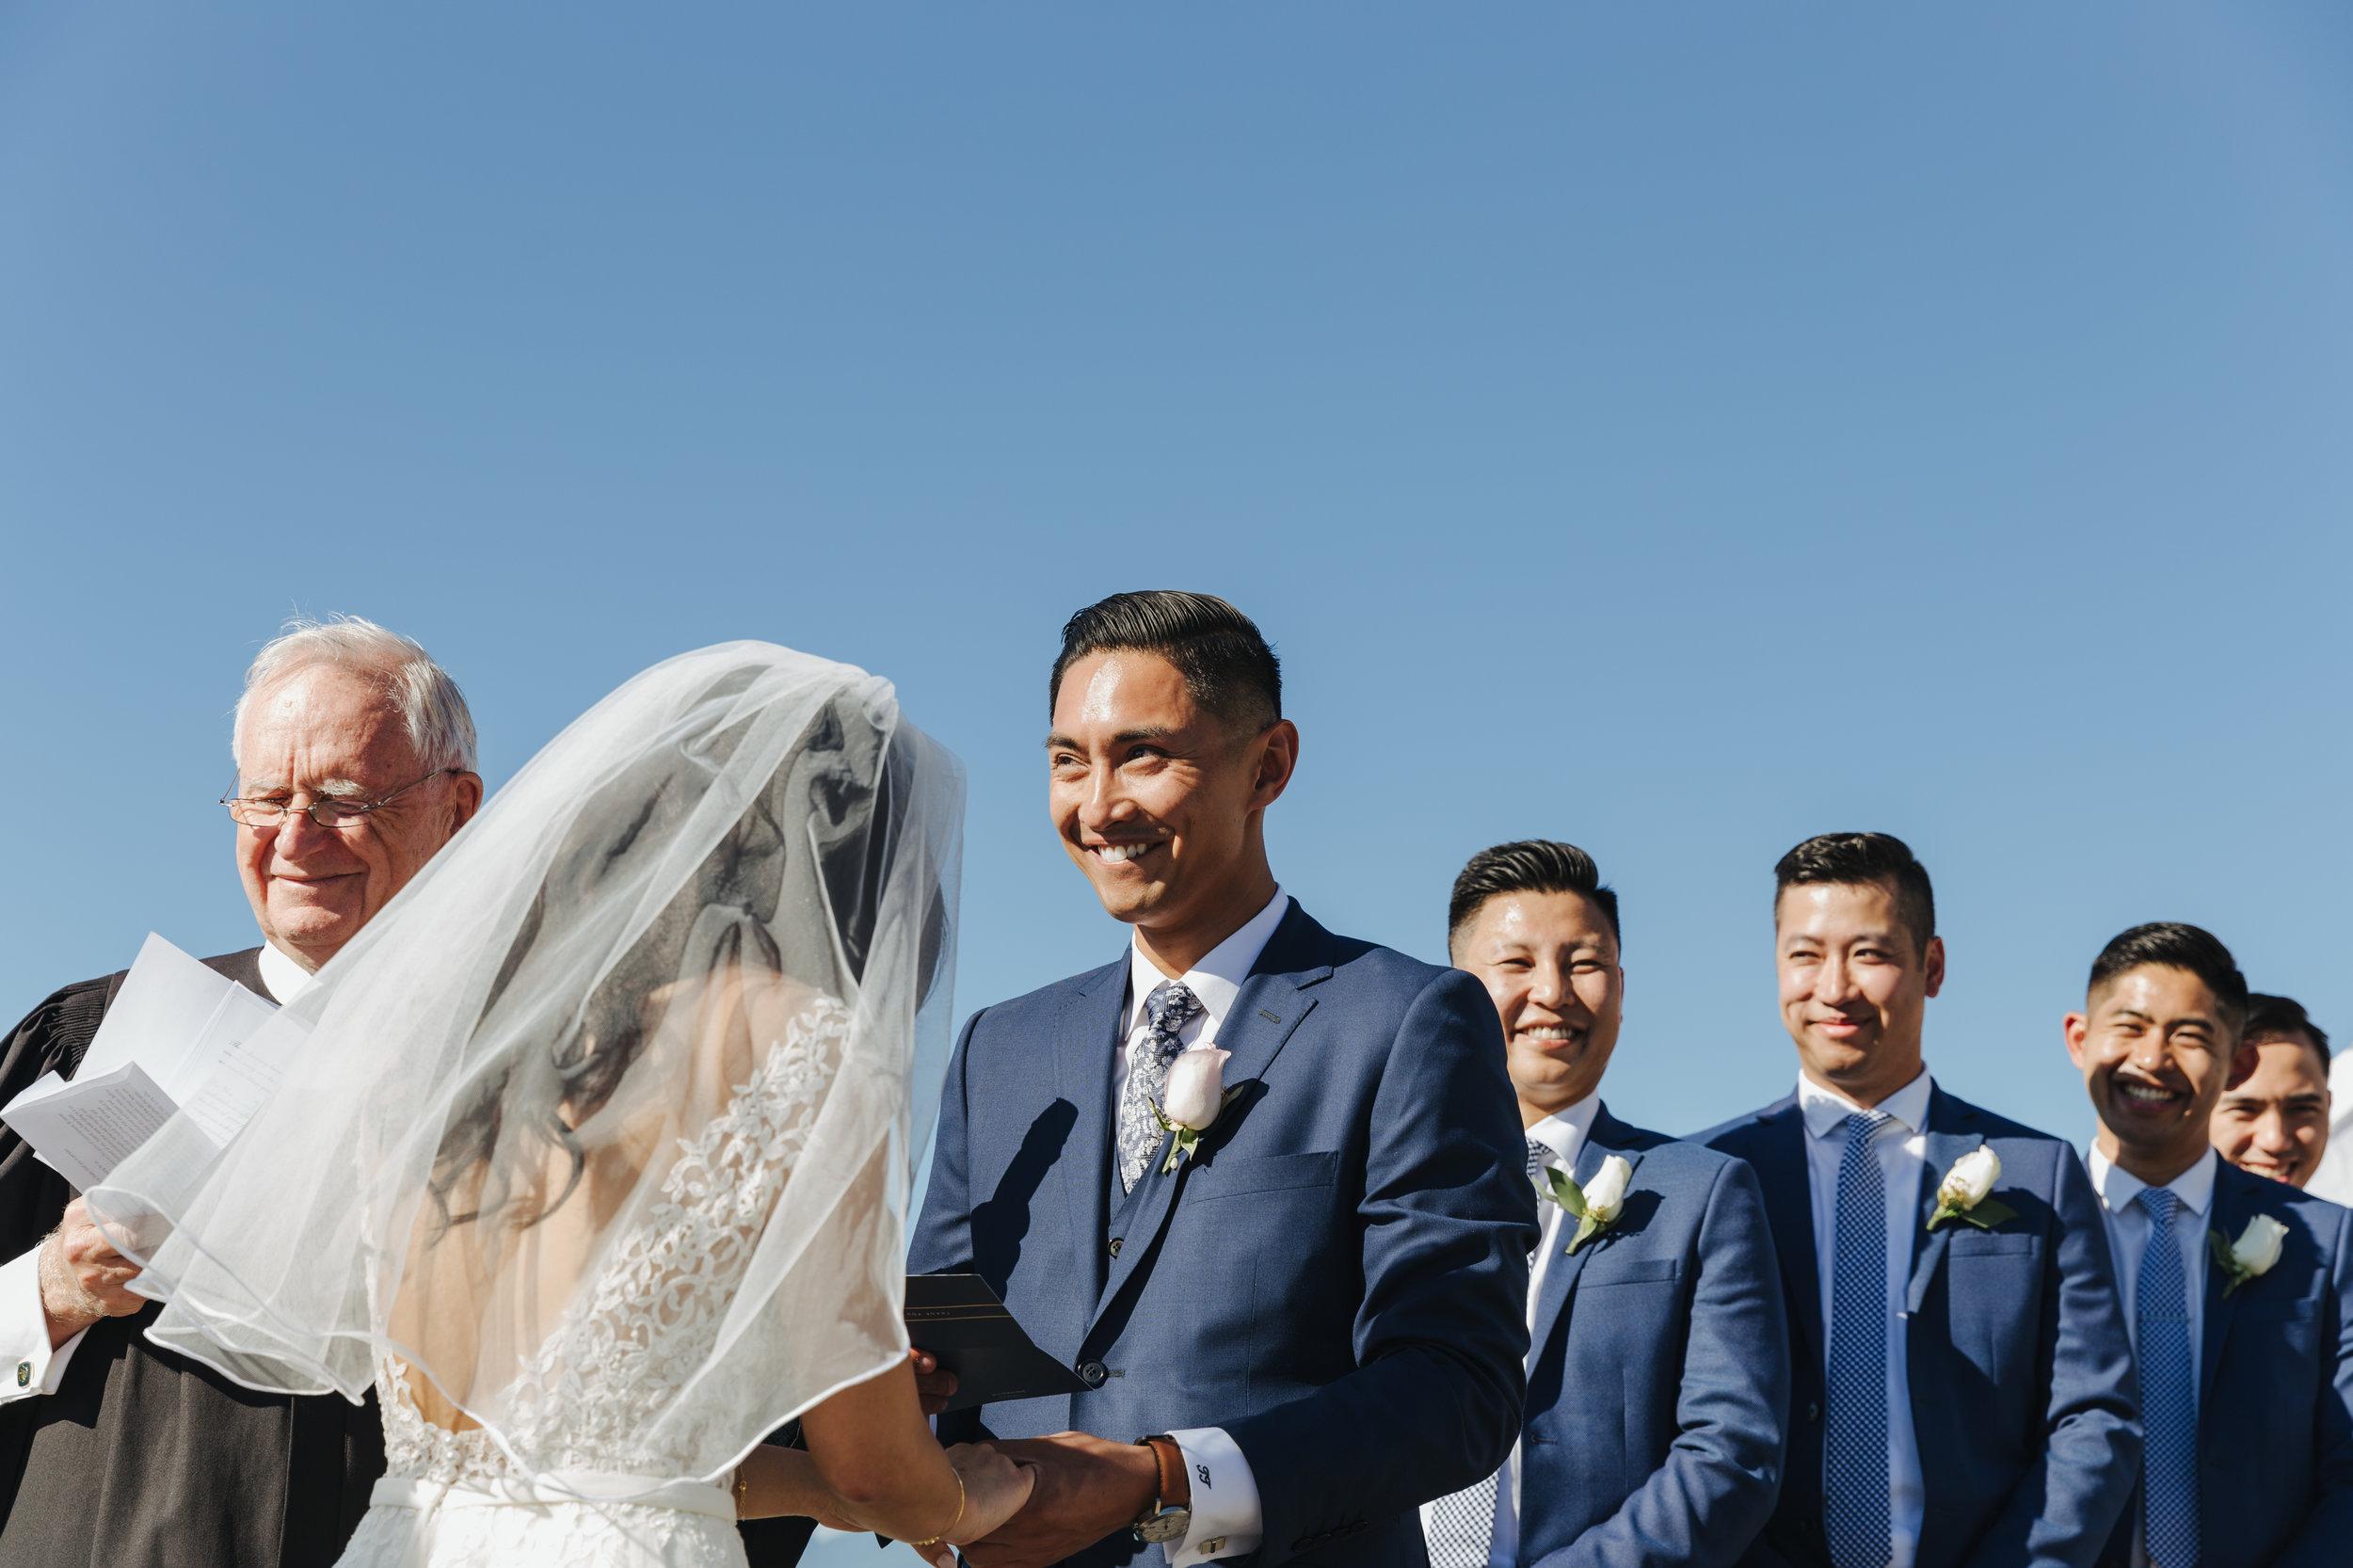 herastudios_wedding_betty_tomy_hera_selects-68.jpg